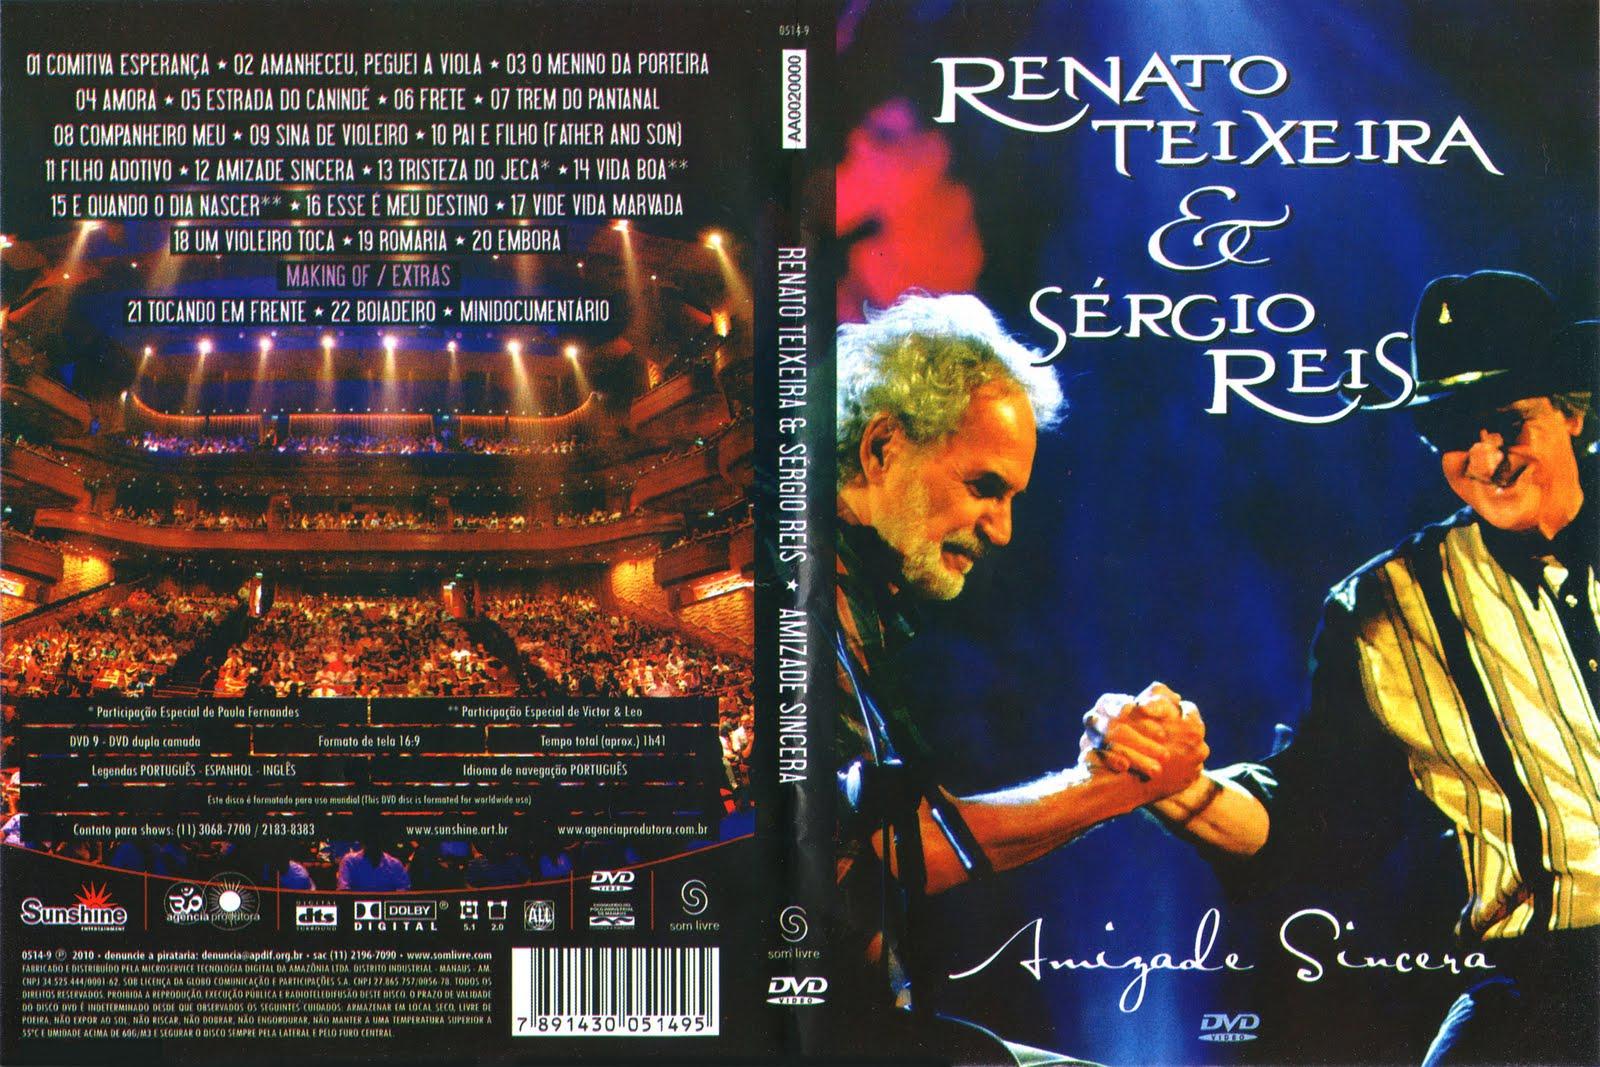 Renato Teixeira & Sergio Reis Amizade Sincera DVDRip + DVD-R Renato Teixeira  2526 S 25C3 25A9rgio Reis   Amizade Sincera